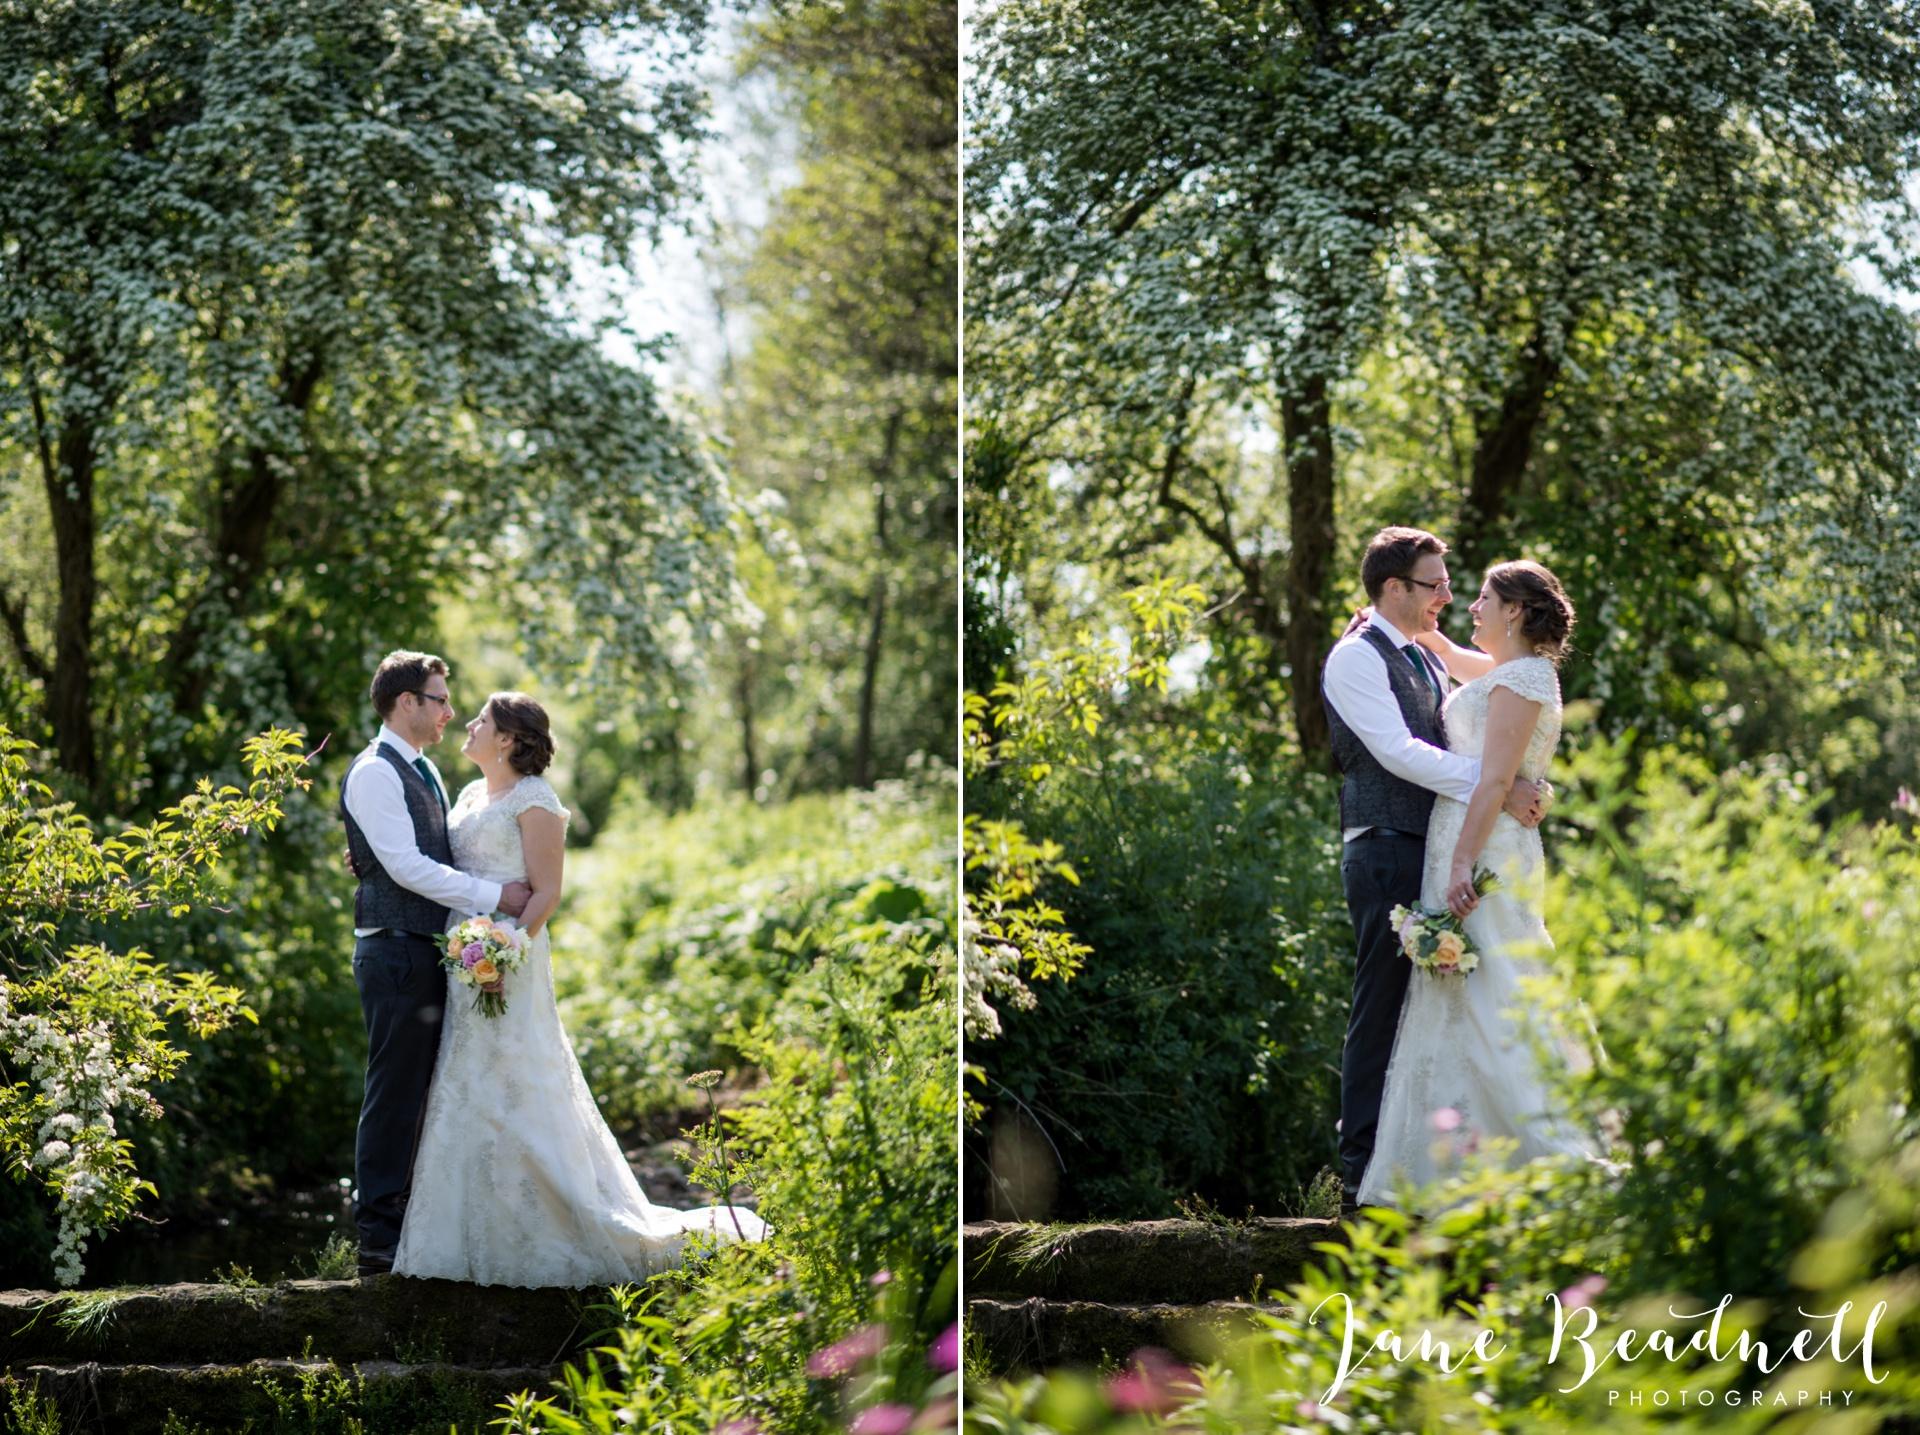 Bath Abbey wedding photography by fine art wedding photographer Leeds Jane Beadnell_41